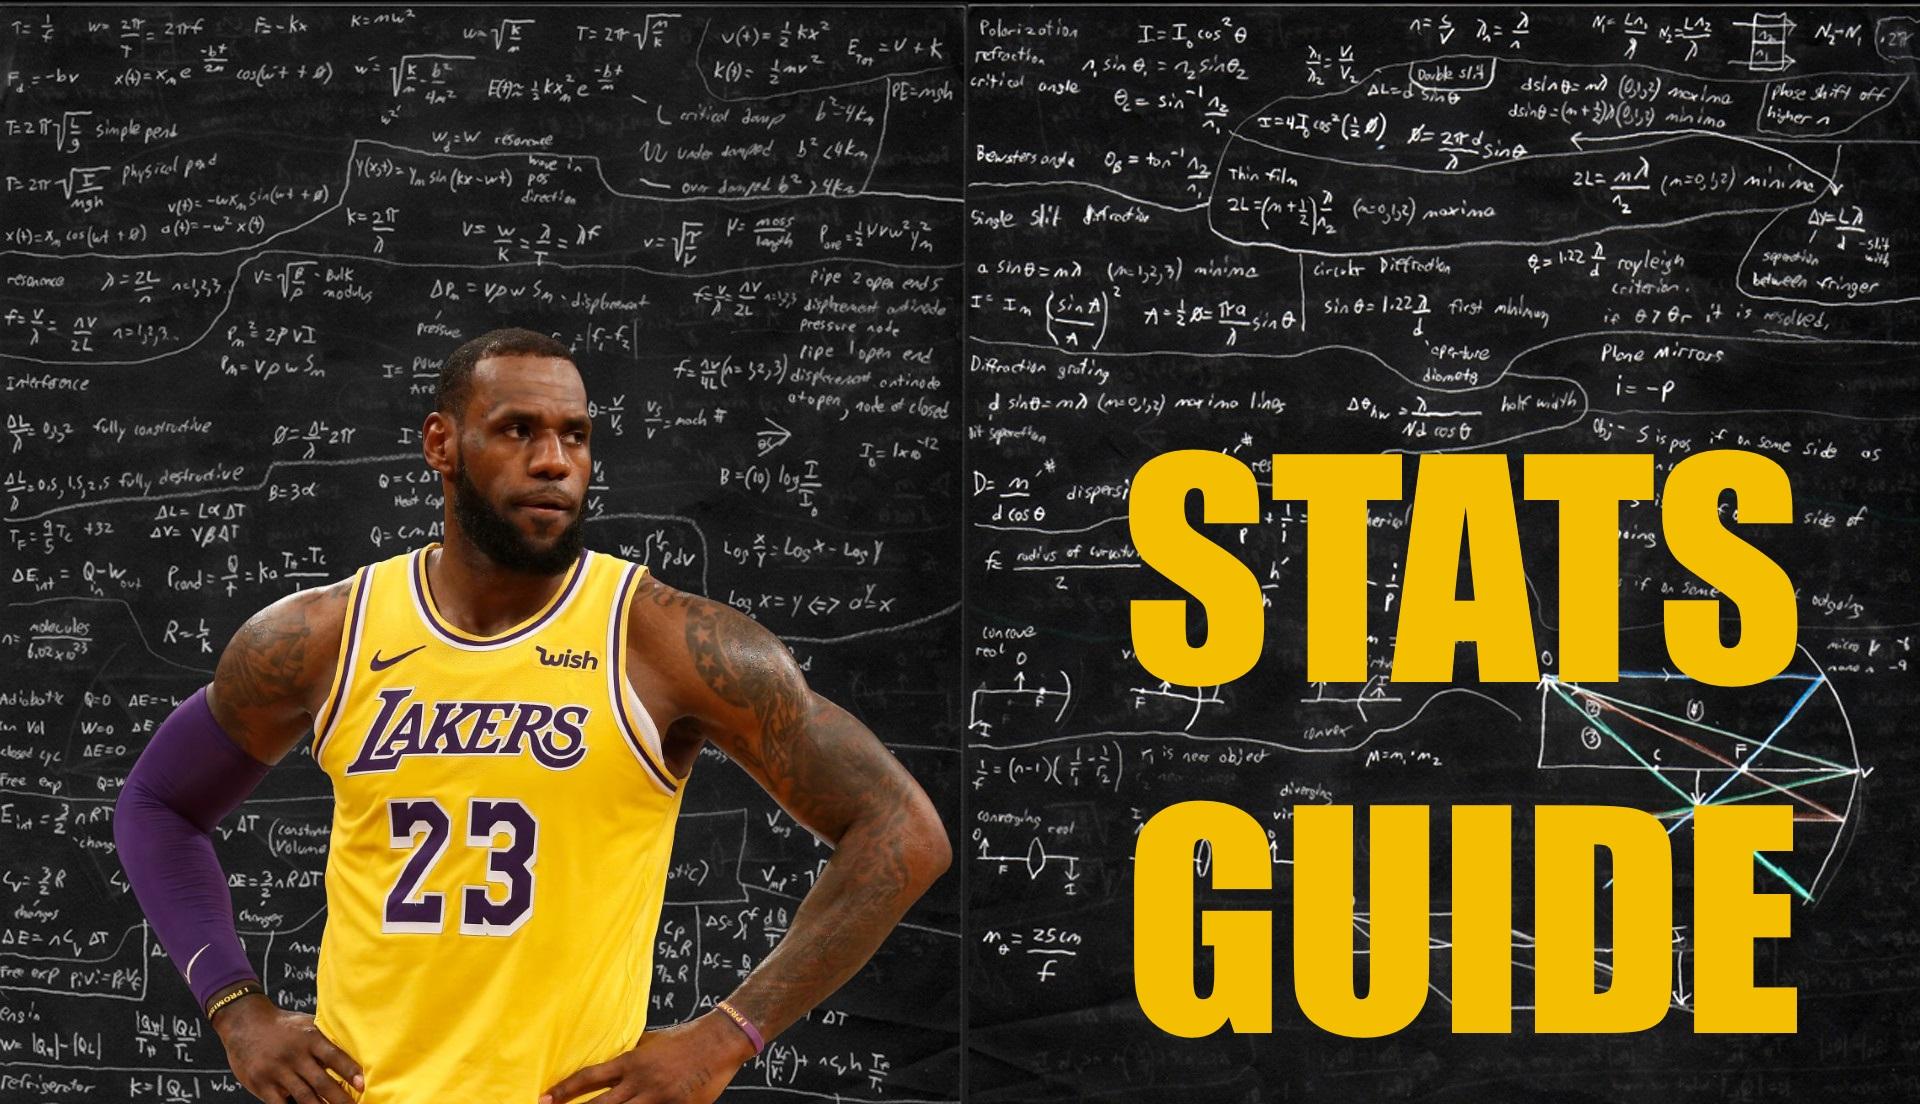 NBA Advanced Stats